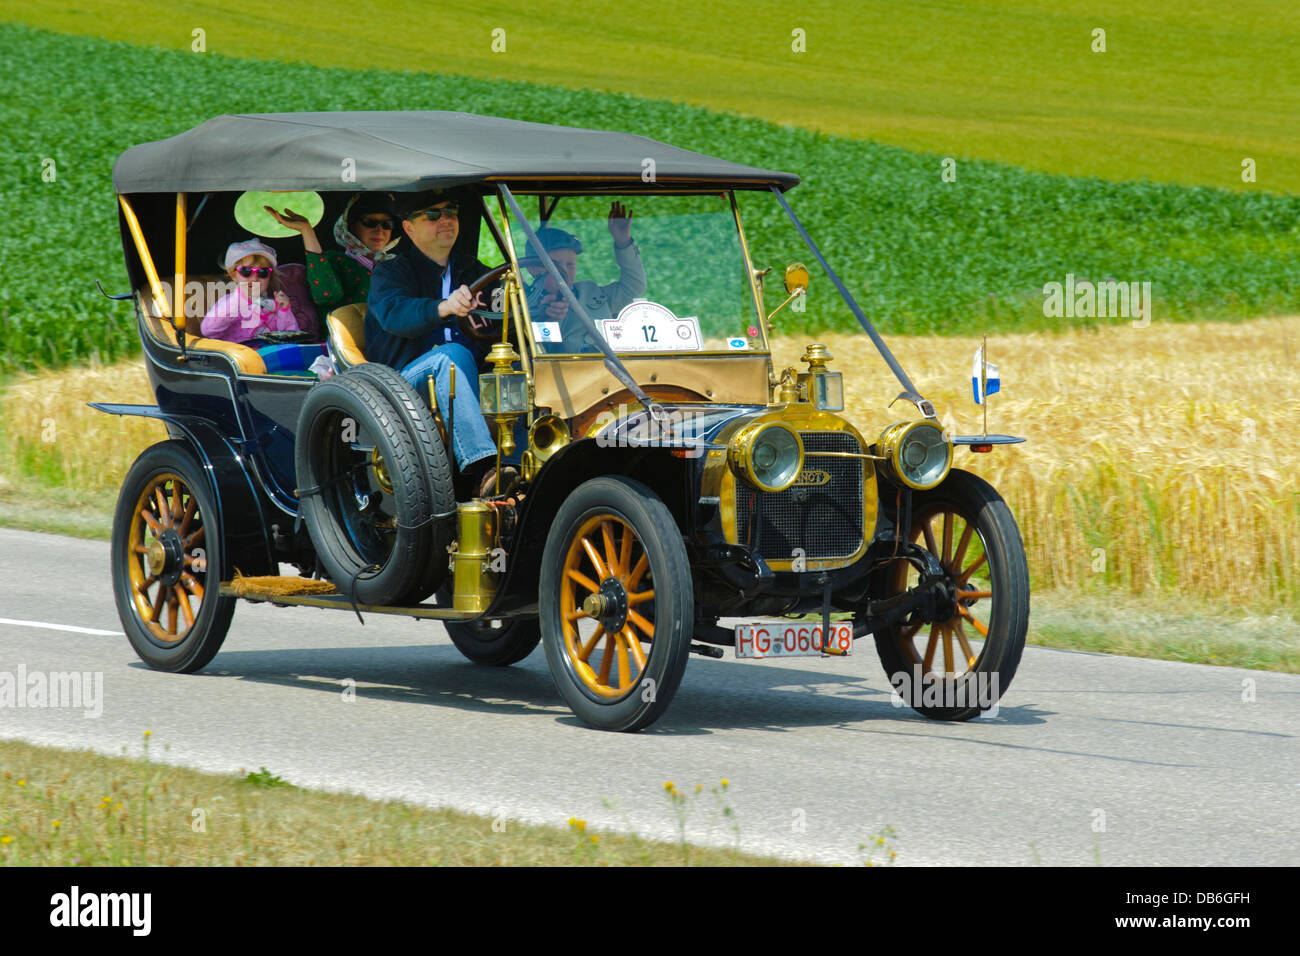 Duhanot CG Bolide, built at year 1907, photo taken on July 13, 2013 in Landsberg, Germany - Stock Image